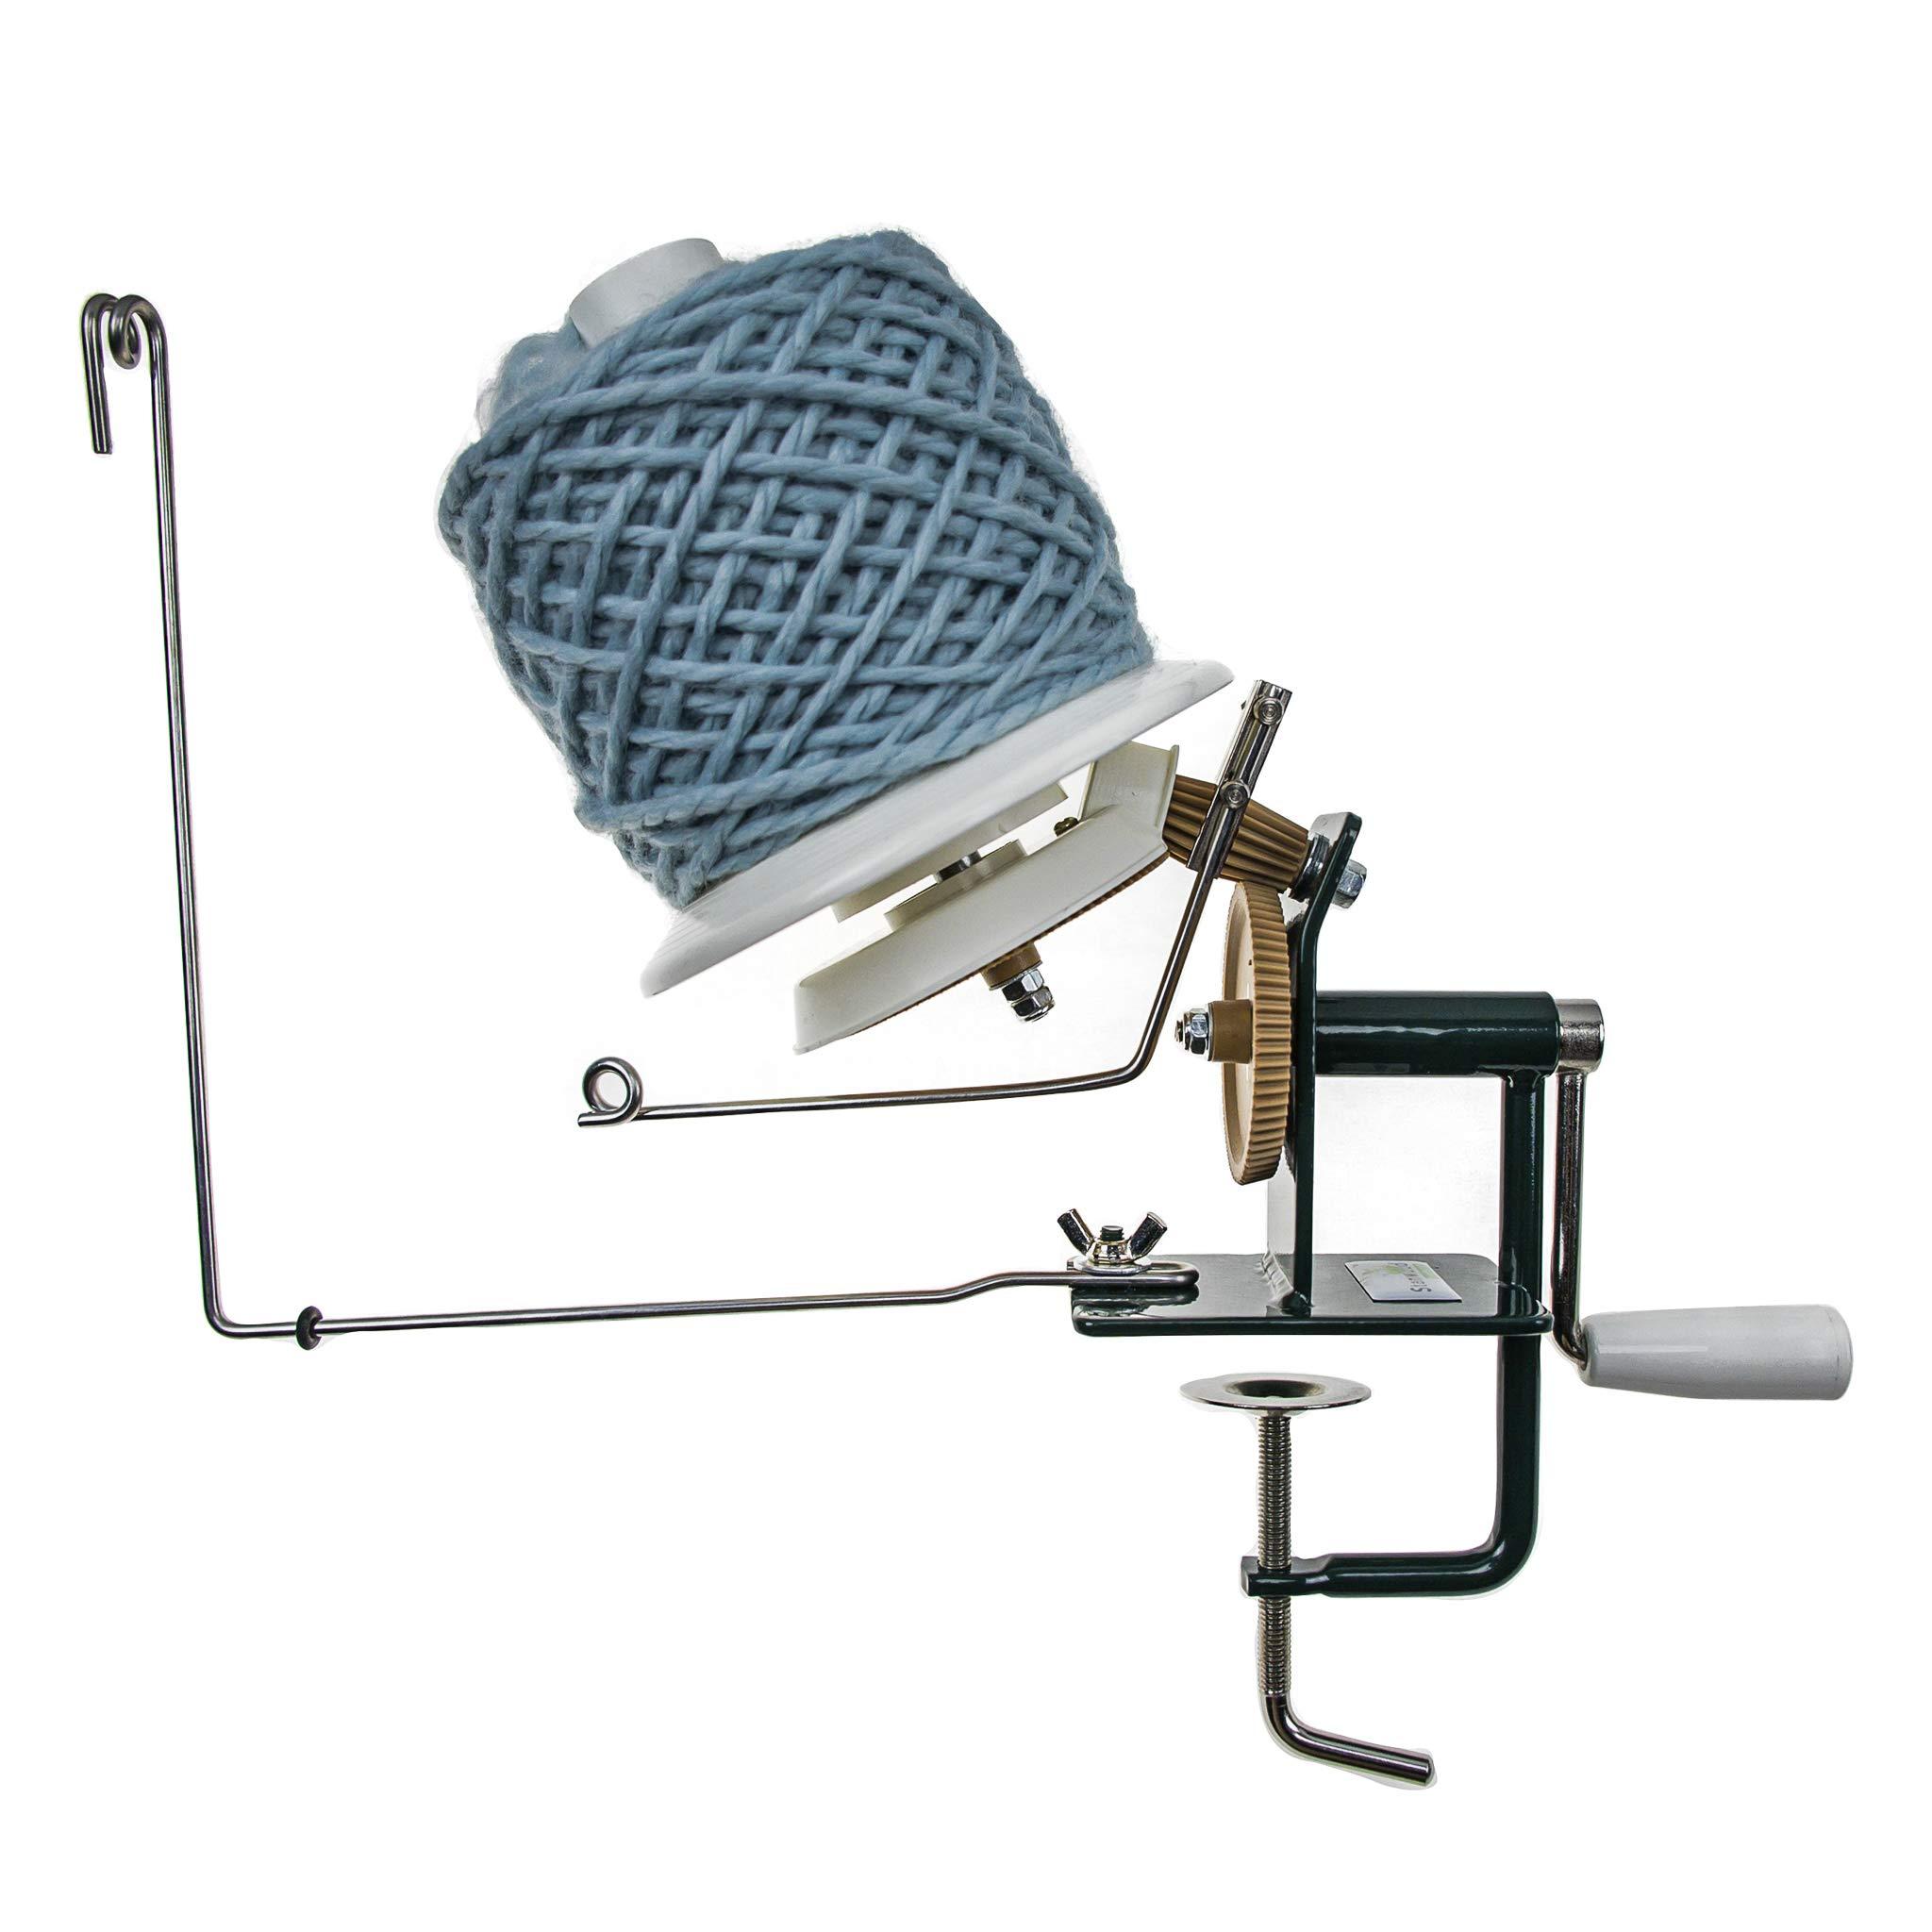 Stanwood Needlecraft Large Metal Yarn/Fiber/Wool/String Ball Winder, 10-Ounce by Stanwood Needlecraft (Image #5)